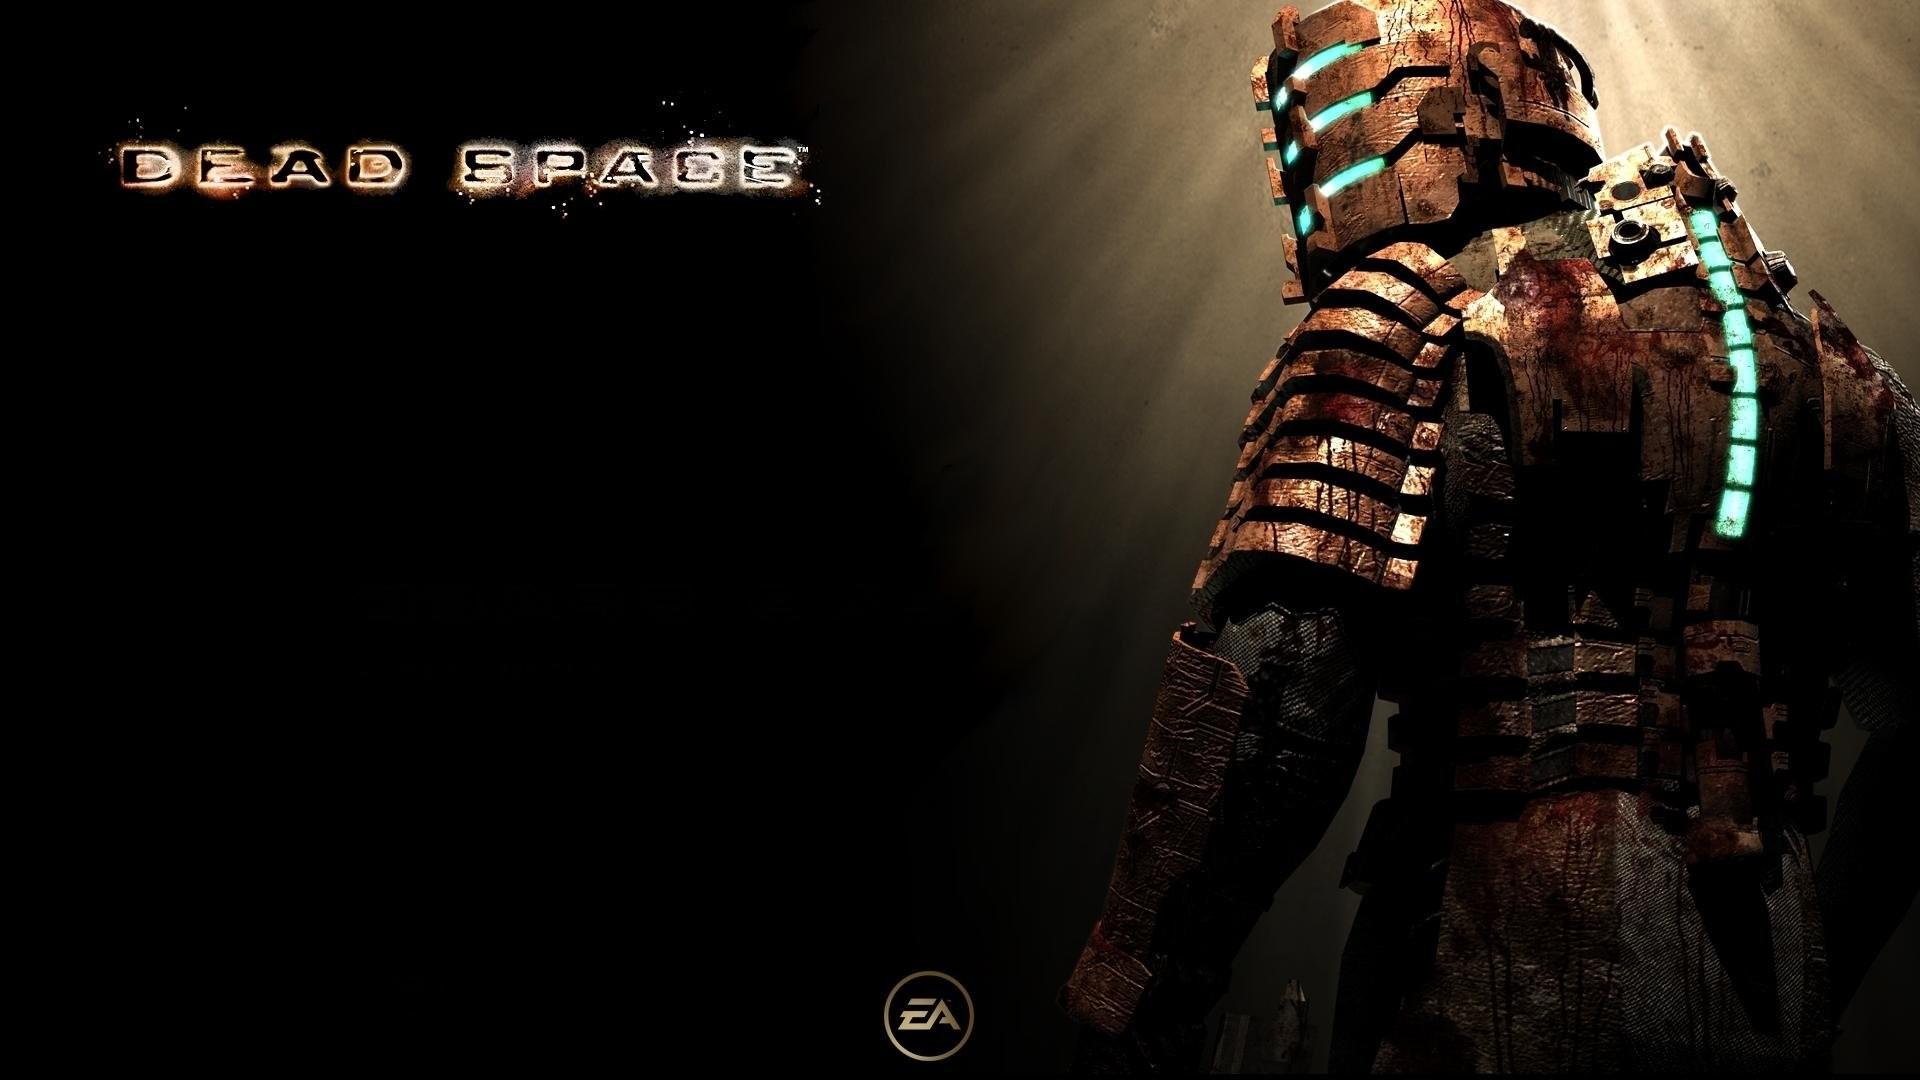 Dead Space Wallpaper (79+ images)